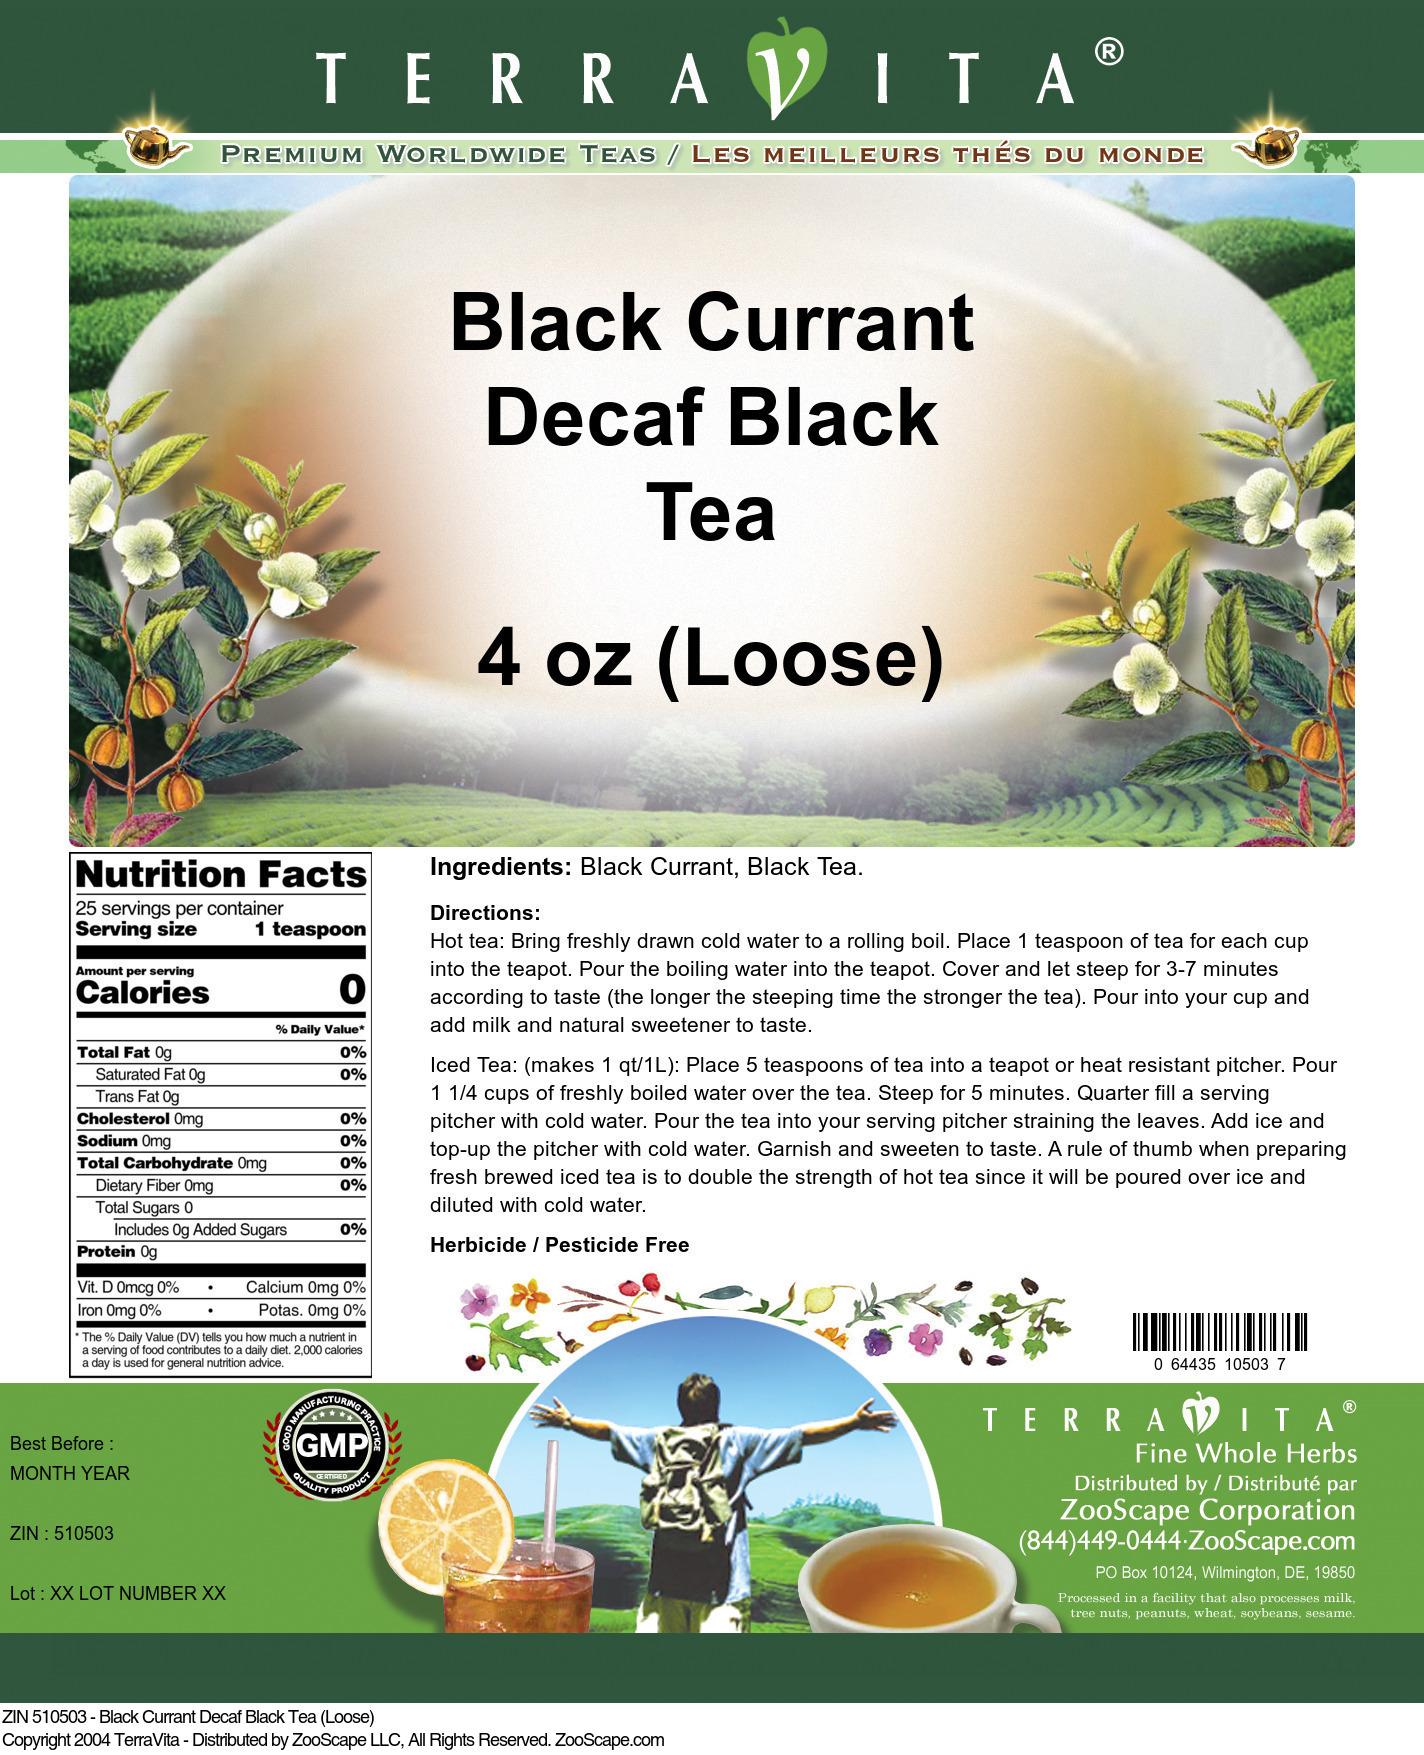 Black Currant Decaf Black Tea (Loose)